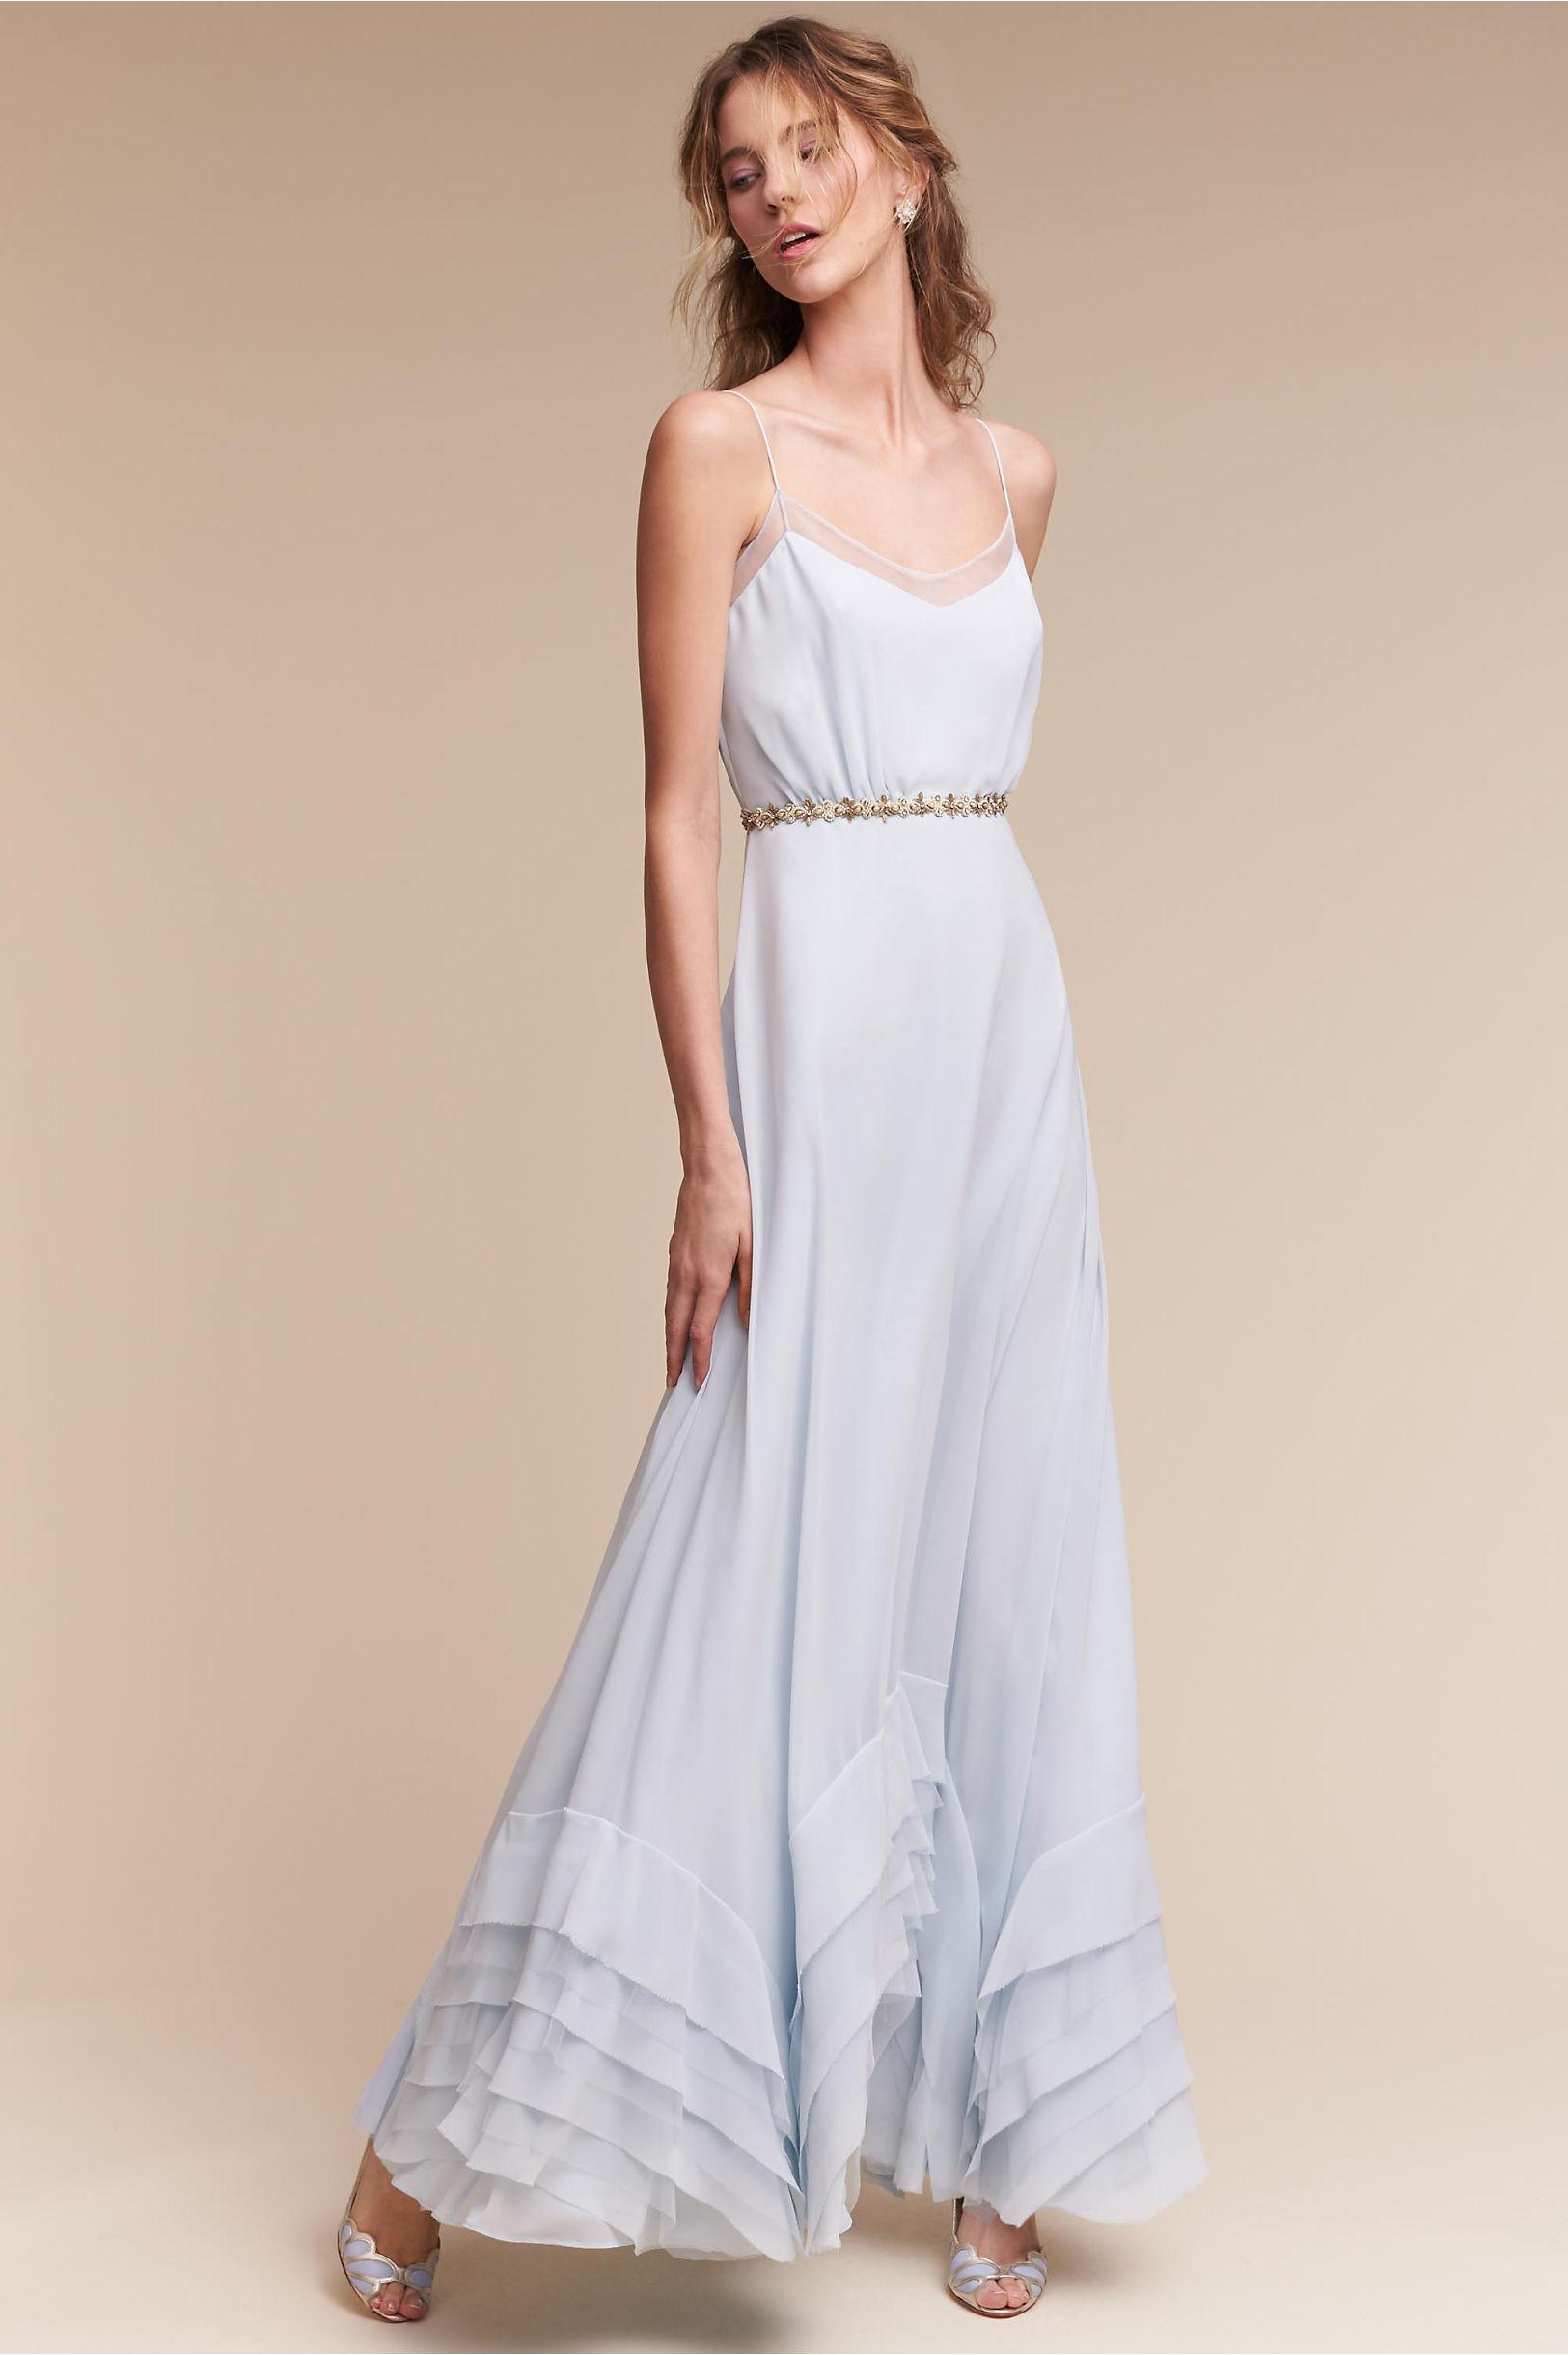 Dove Dress in Sale | BHLDN